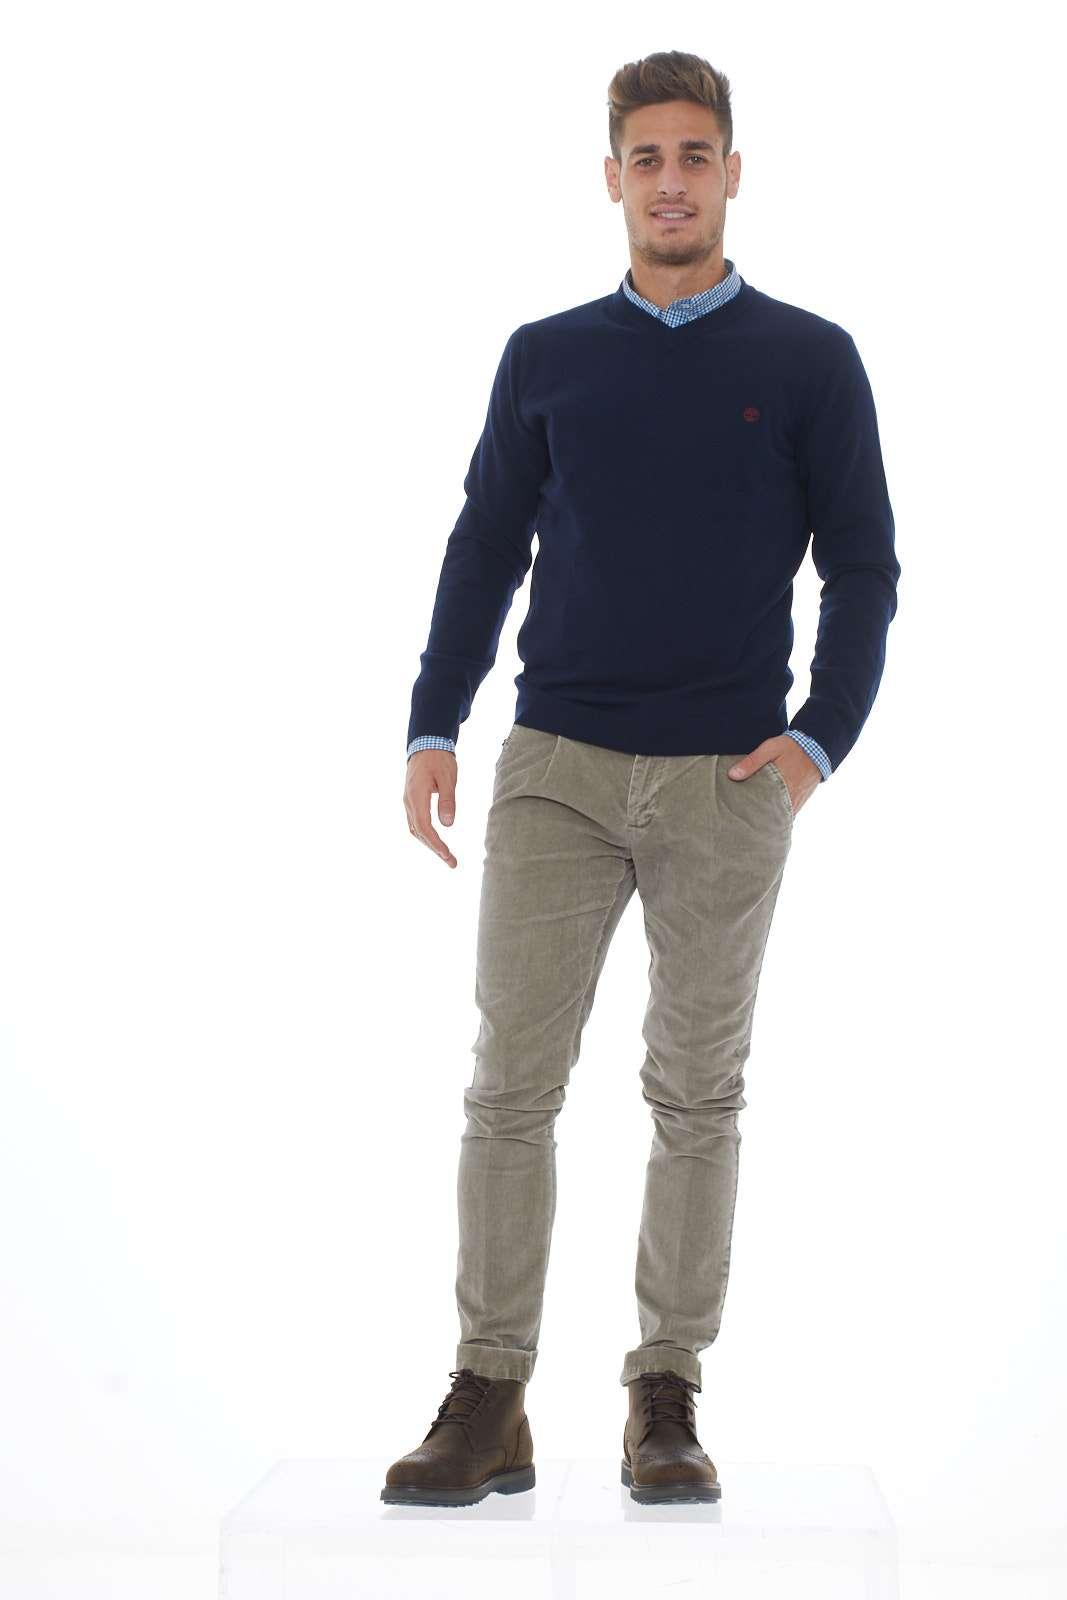 https://www.parmax.com/media/catalog/product/a/i/ai-outlet_parmax-pantaloni-uomo-entre-amis-a1983191001-d.jpg